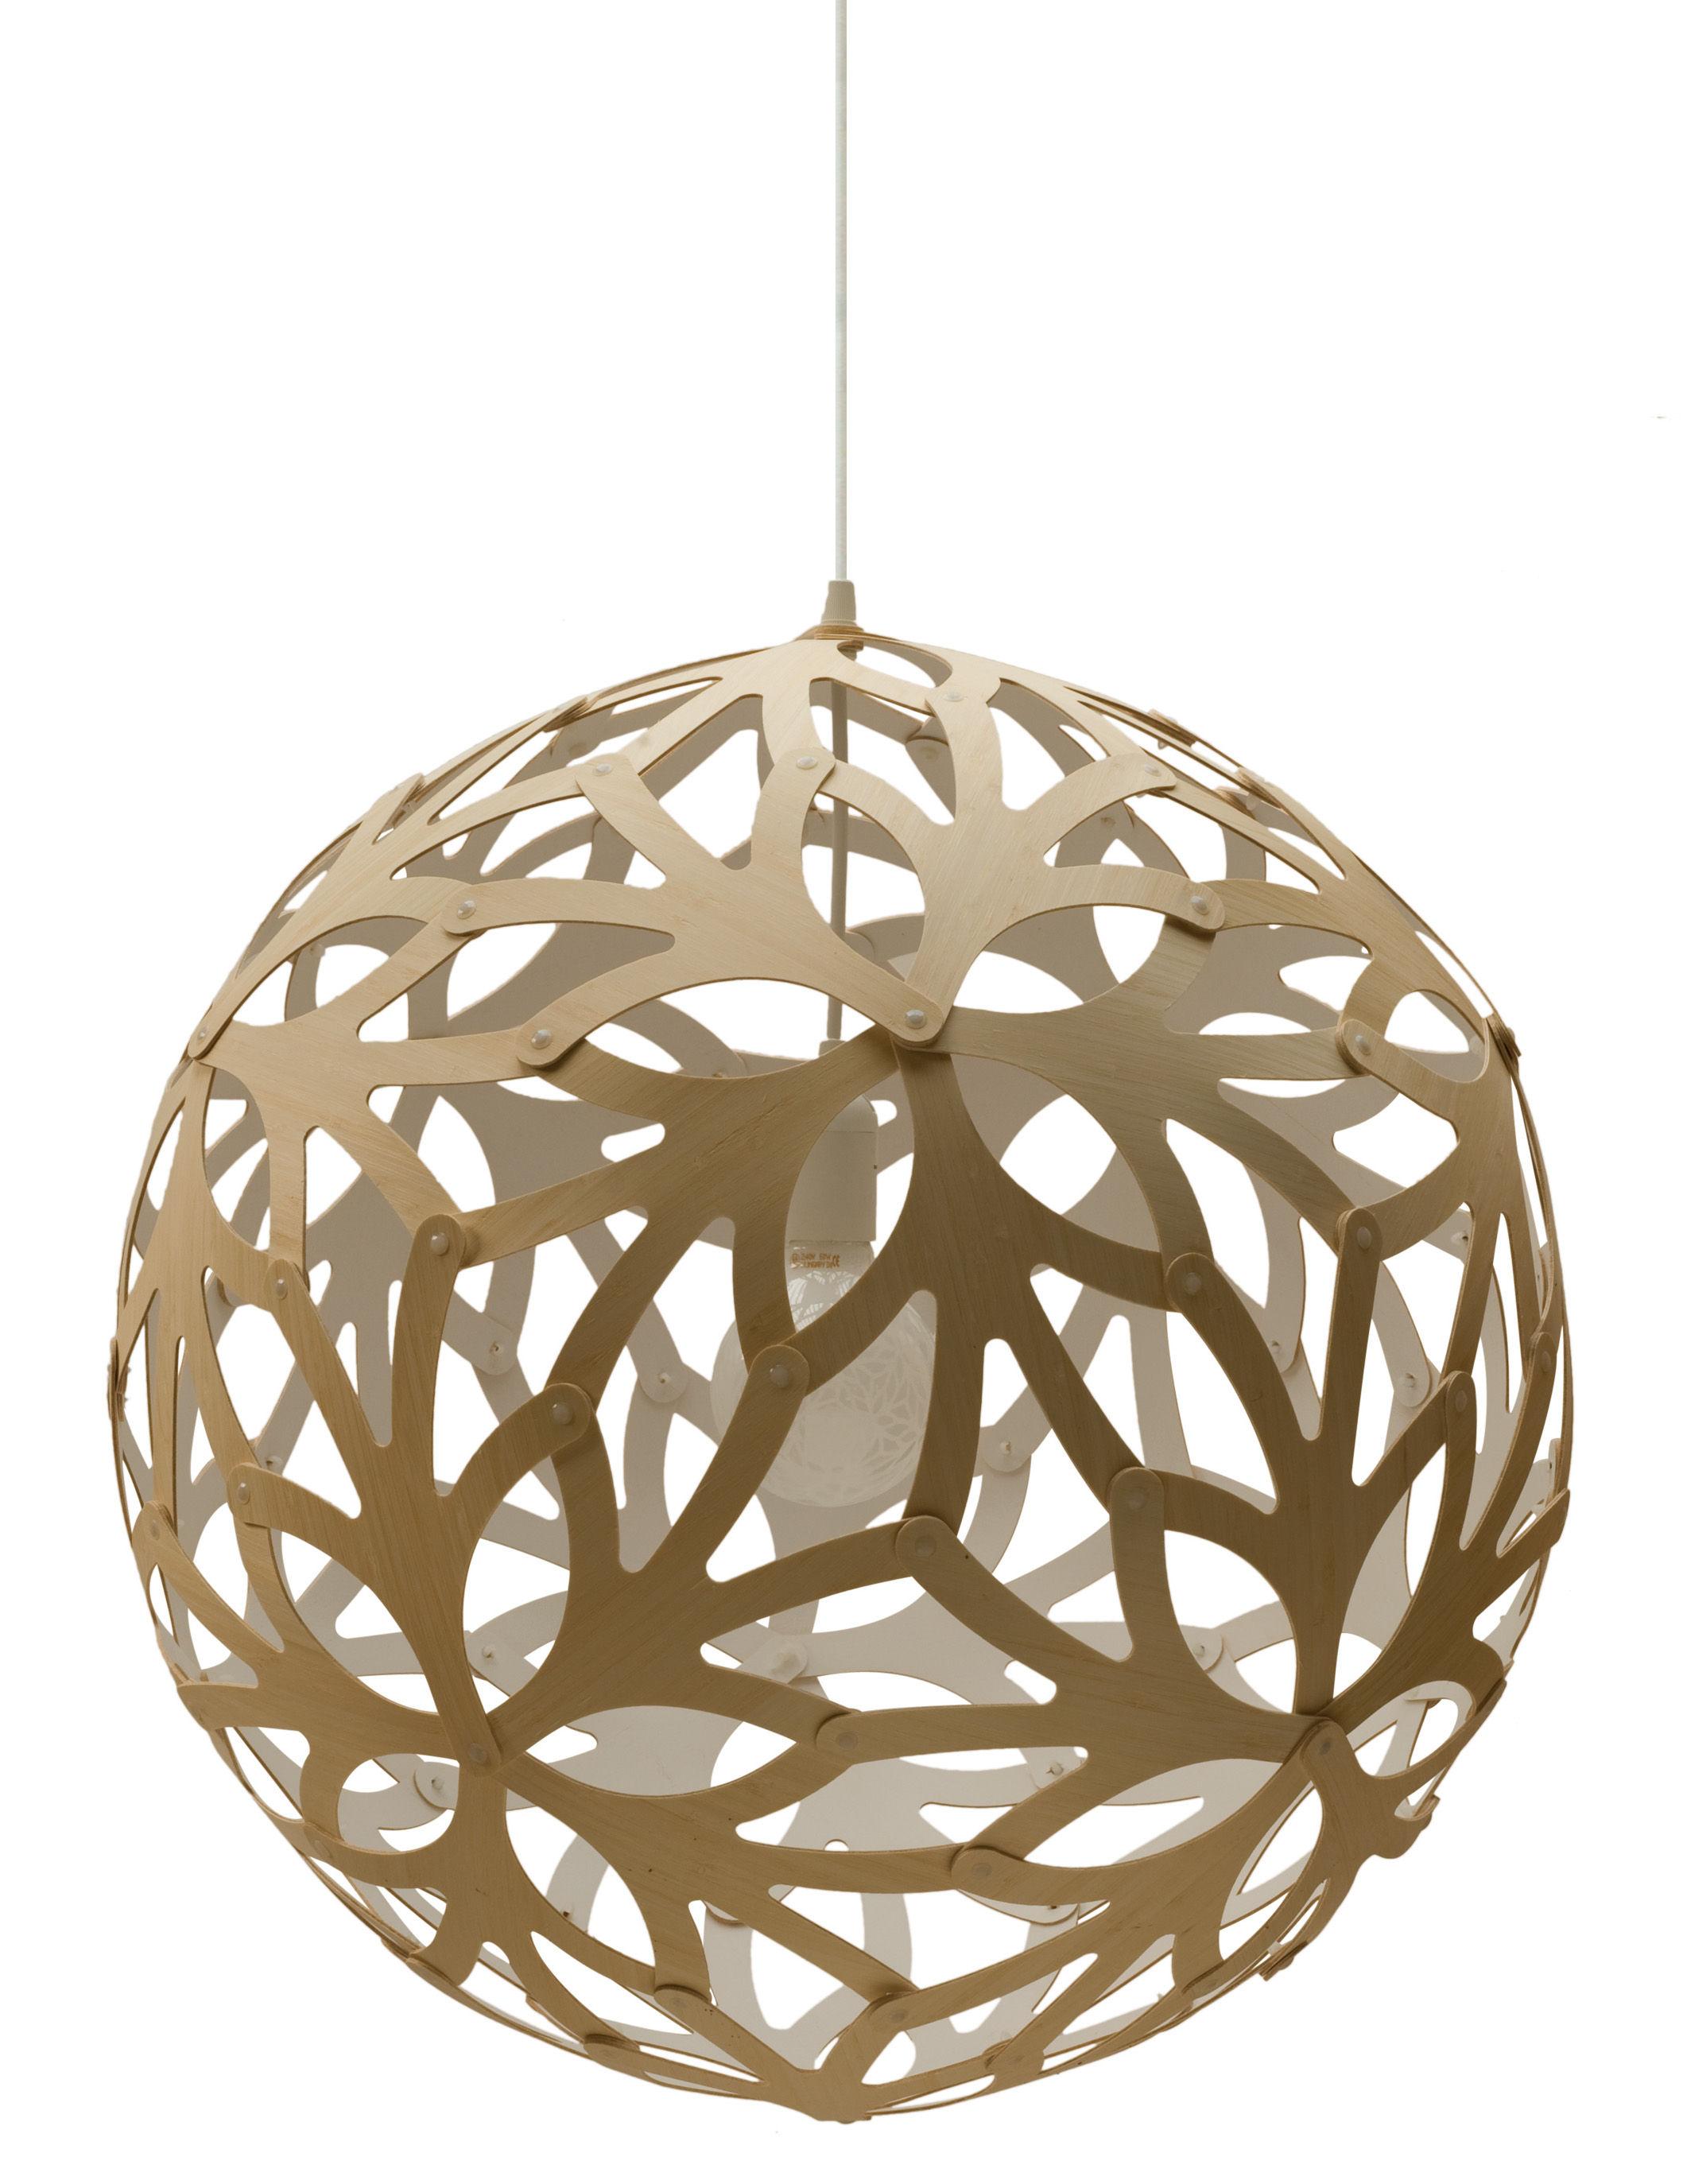 Lighting - Pendant Lighting - Floral Pendant - Ø 60 cm - Bicoloured by David Trubridge - White / Natural wood - Pine